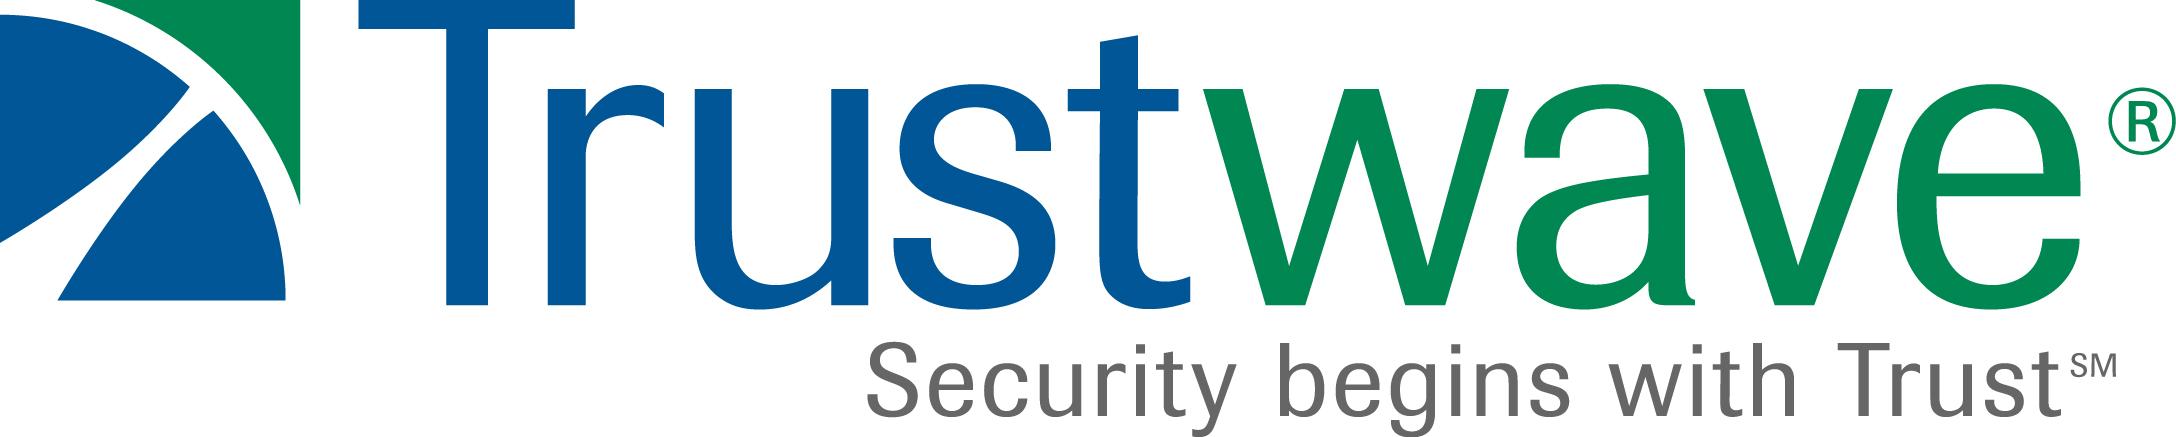 ElevenPaths Elevenpaths Web Security Gateway -vs- Intel